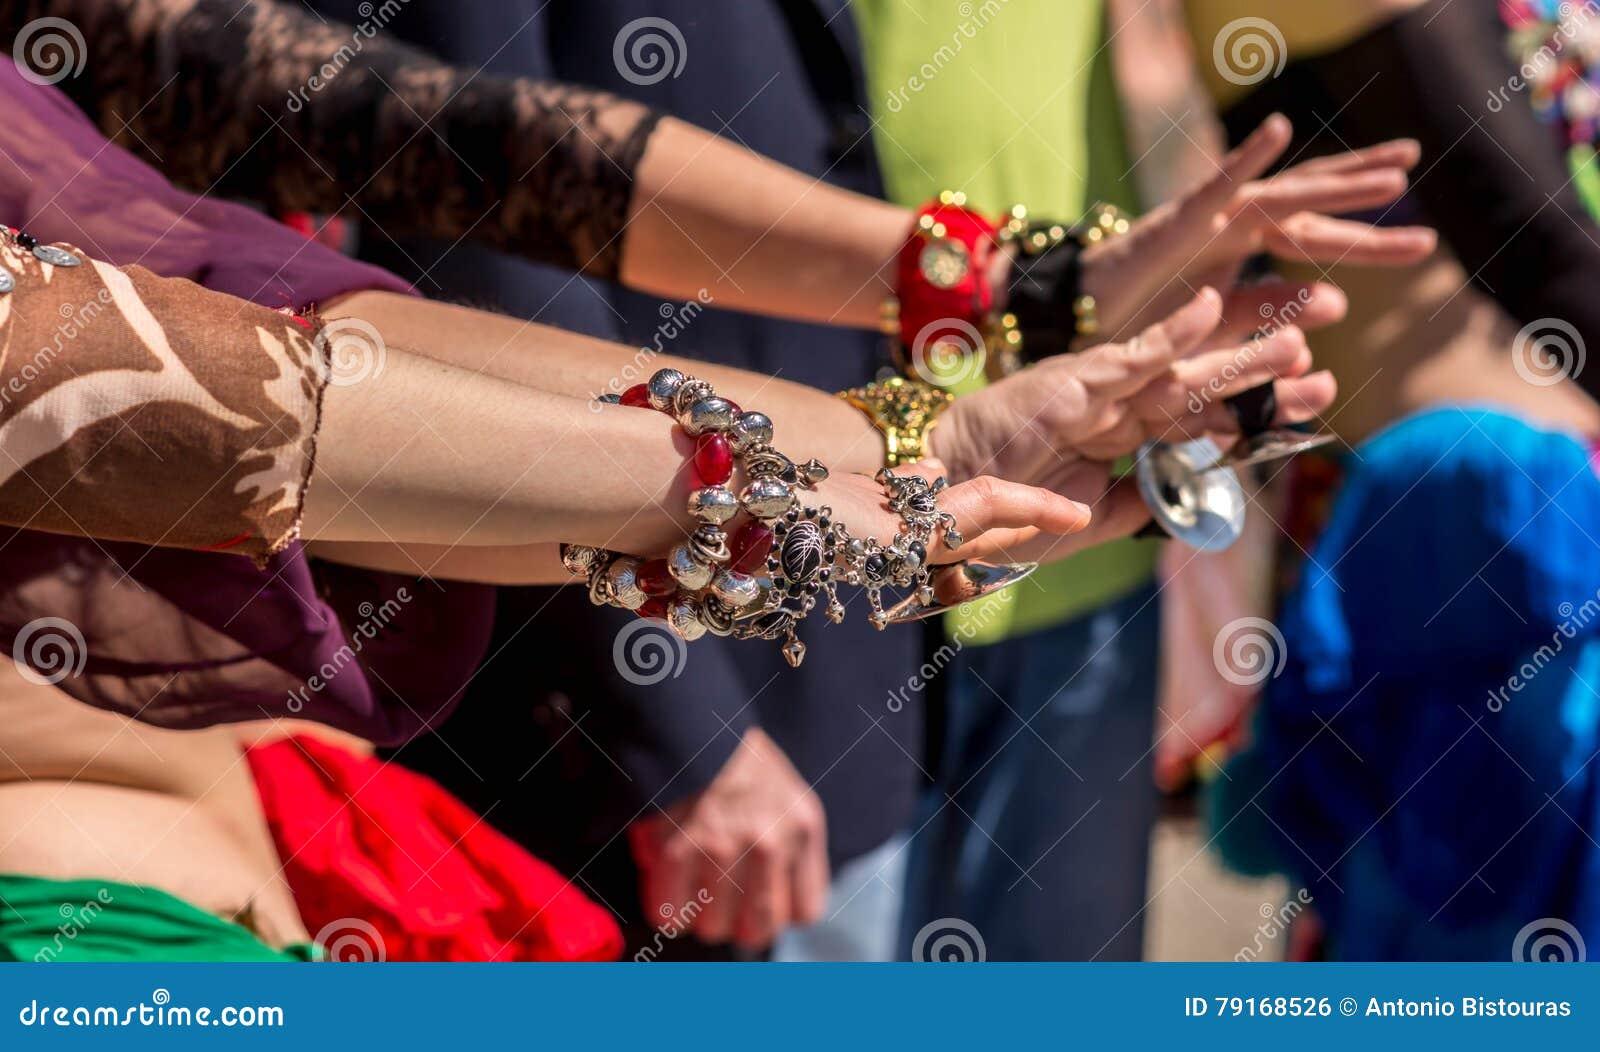 Dancer´s hands during a dancing show.